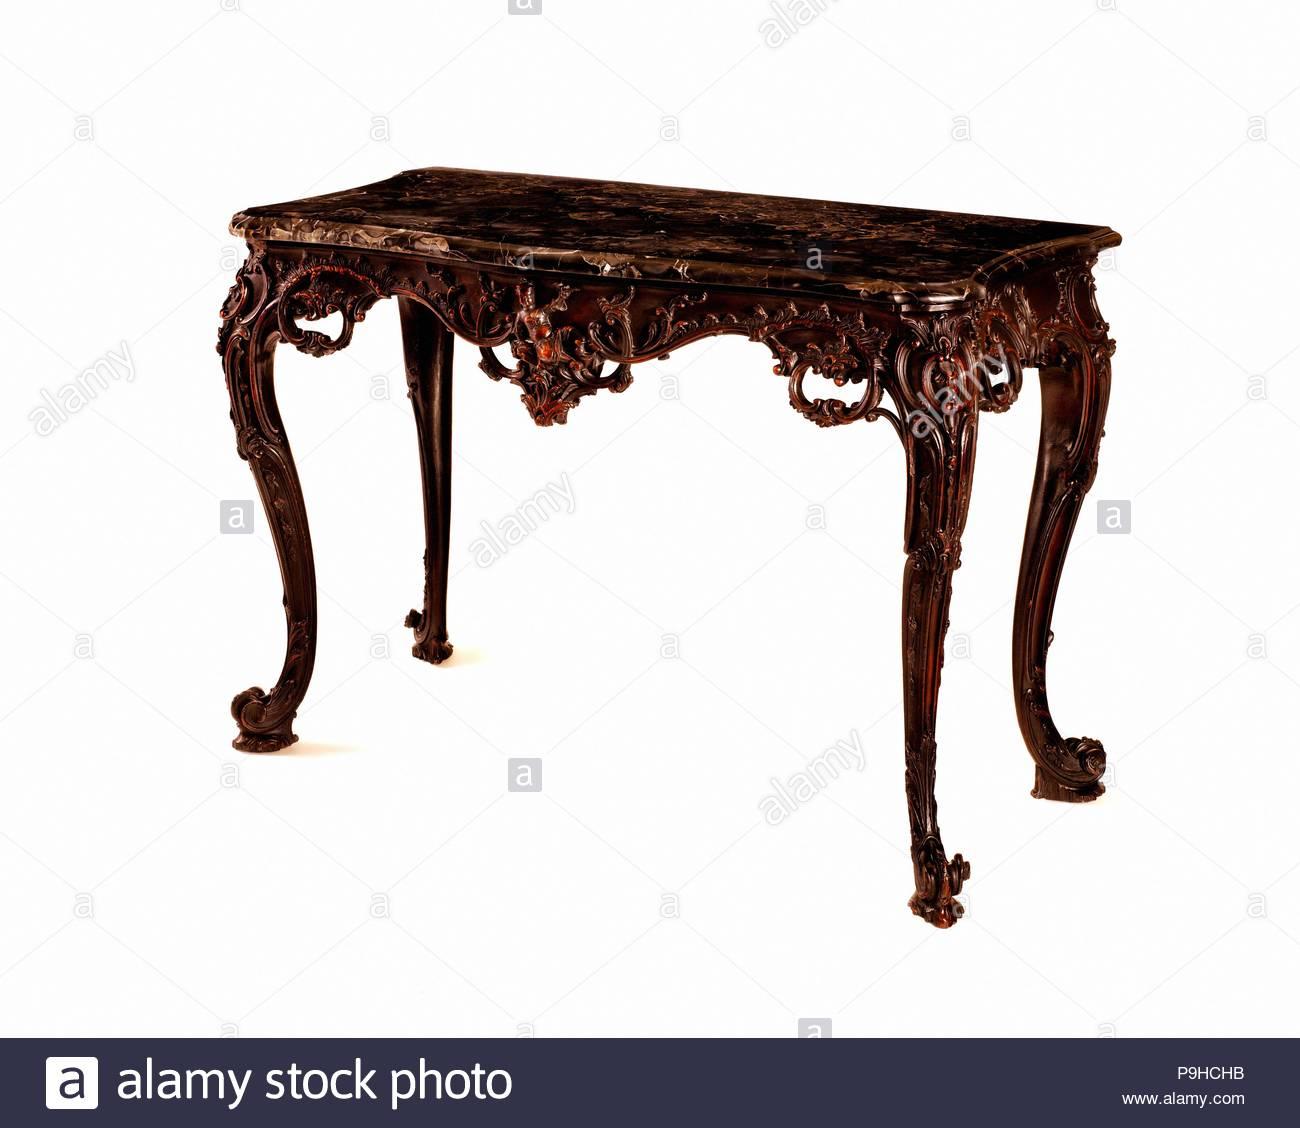 Marble Slab Table, 1765u201370, Made In Philadelphia, Pennsylvania, United  States, American, Mahogany, Marble, Black Walnut, Yellow Pine, 32 3/8 X 48  1/4 X 23 ...